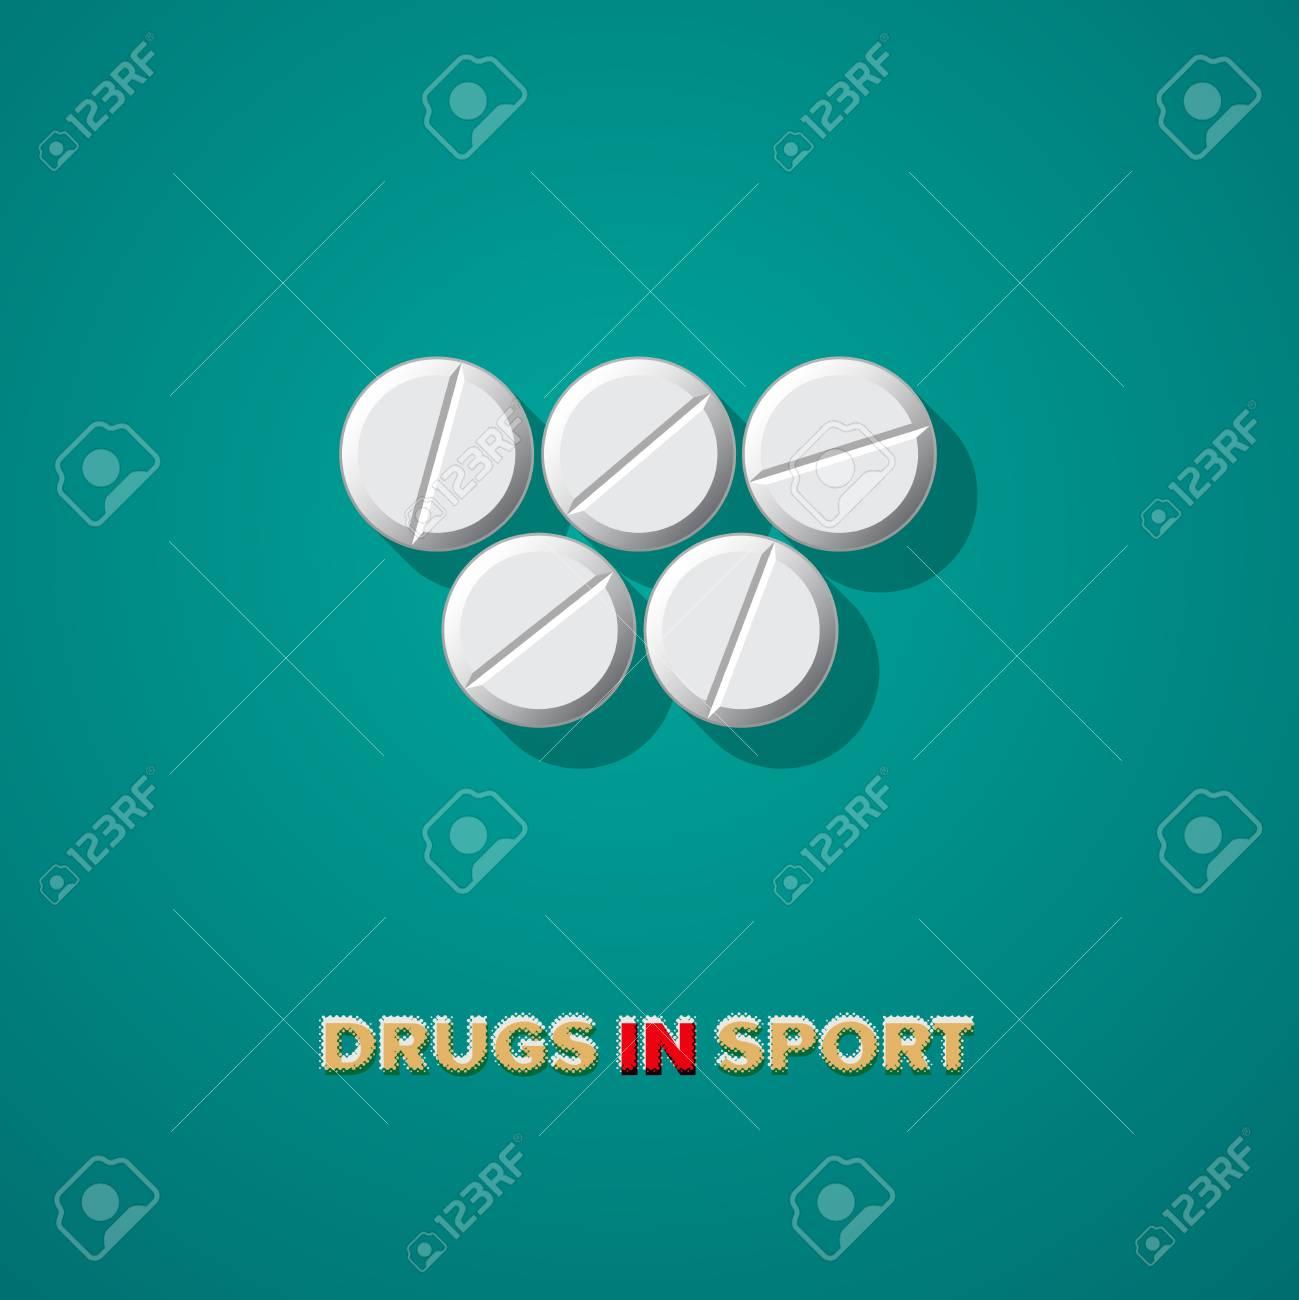 Drugs in sport, vector Eps10 illustration. Stock Vector - 22298991